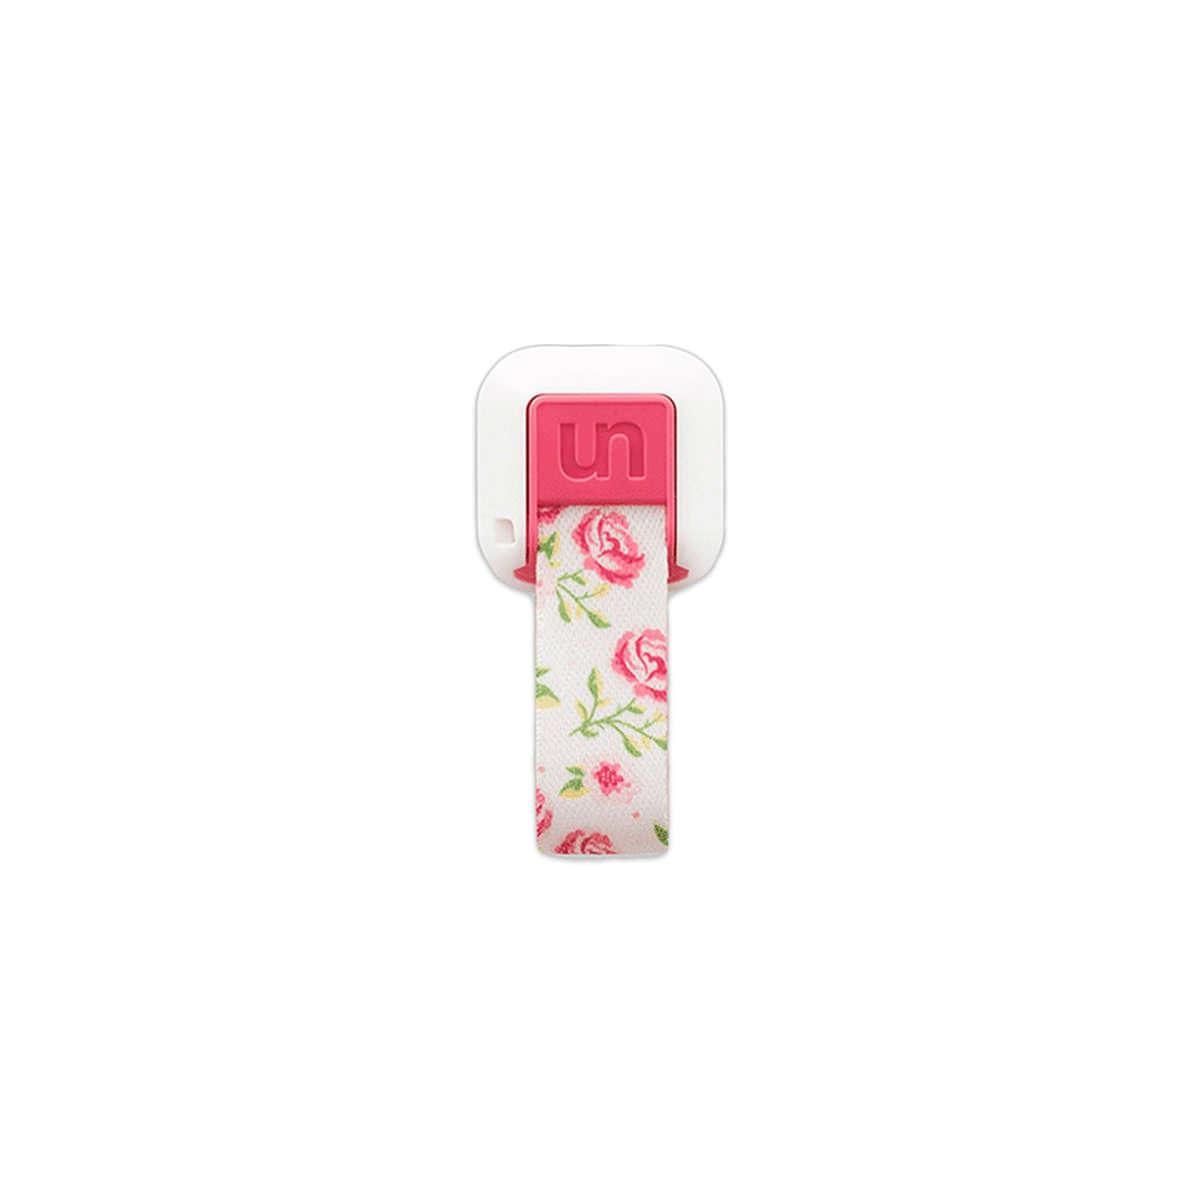 UNGRIP Phone Holder Floral